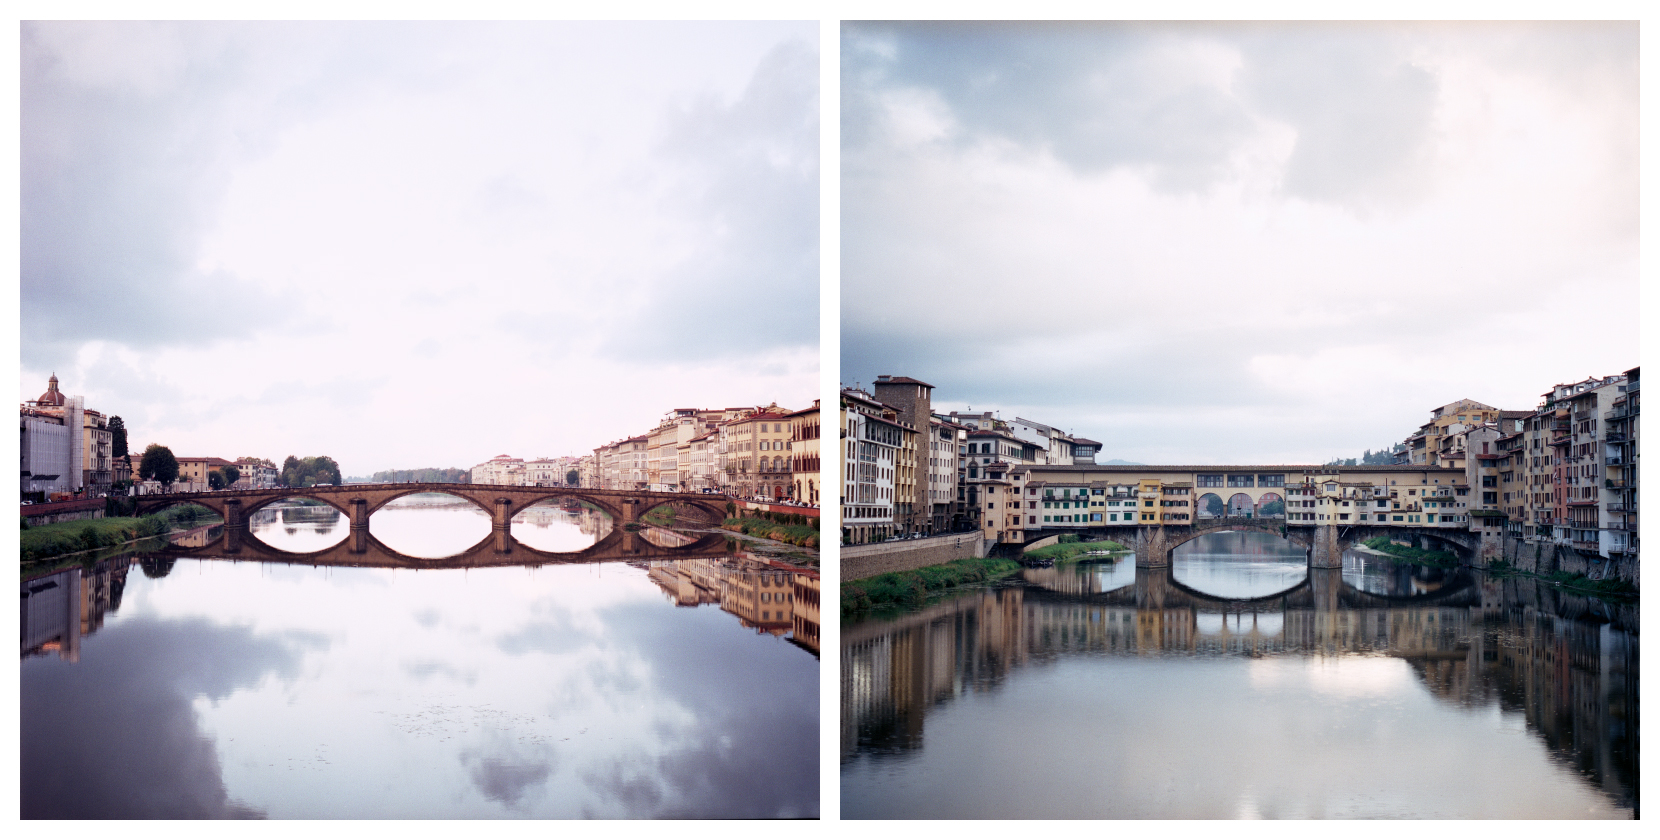 Ponte alla Carraia und Ponte Vecchio, Hasselblad 500 C/M, Carl Zeiss Planar 2.8/80 CF, Fujifilm Pro 400 H, Epson Scan